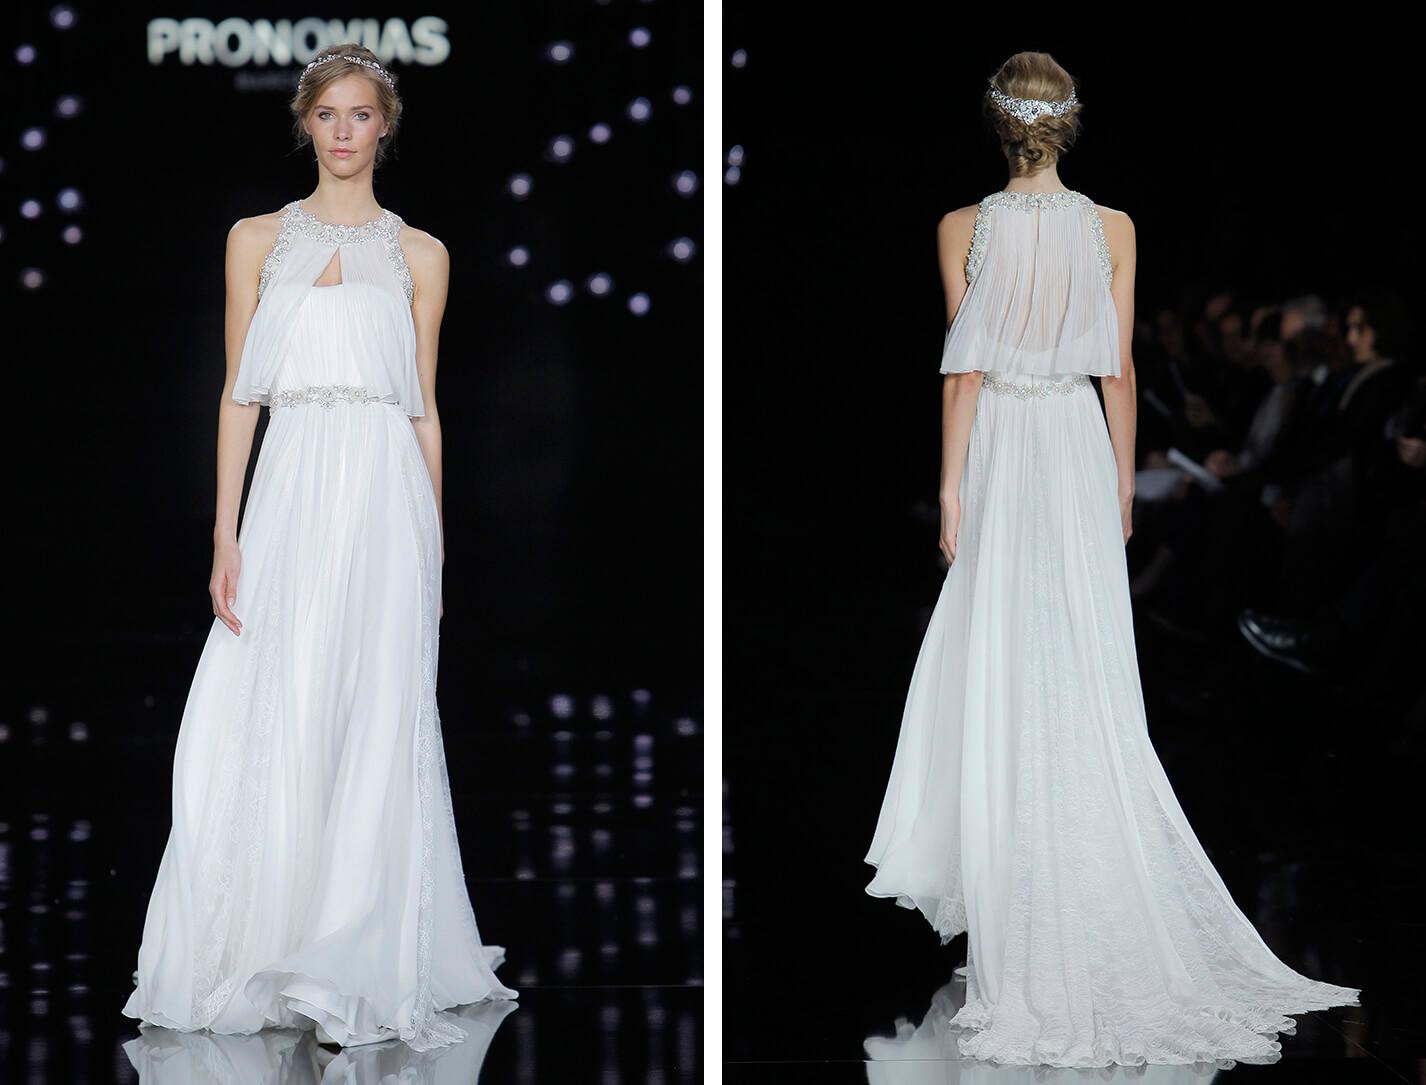 PRONOVIAS_Fashion_Show_2017_Nerea